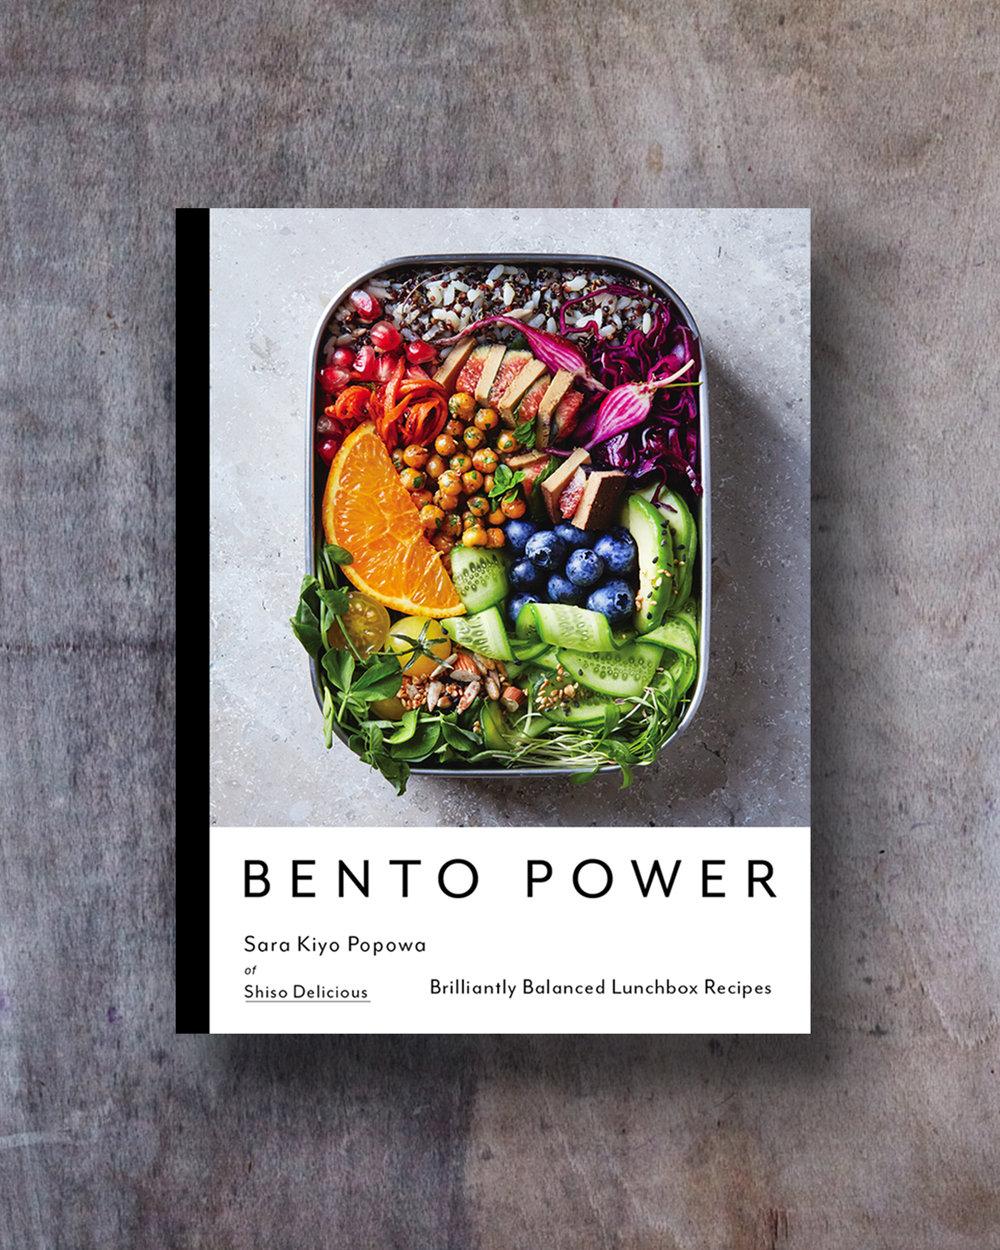 Sara Kiyo Popowa Bento Power Brilliatly Balanced Lunchbox recipes - Shiso Delicious